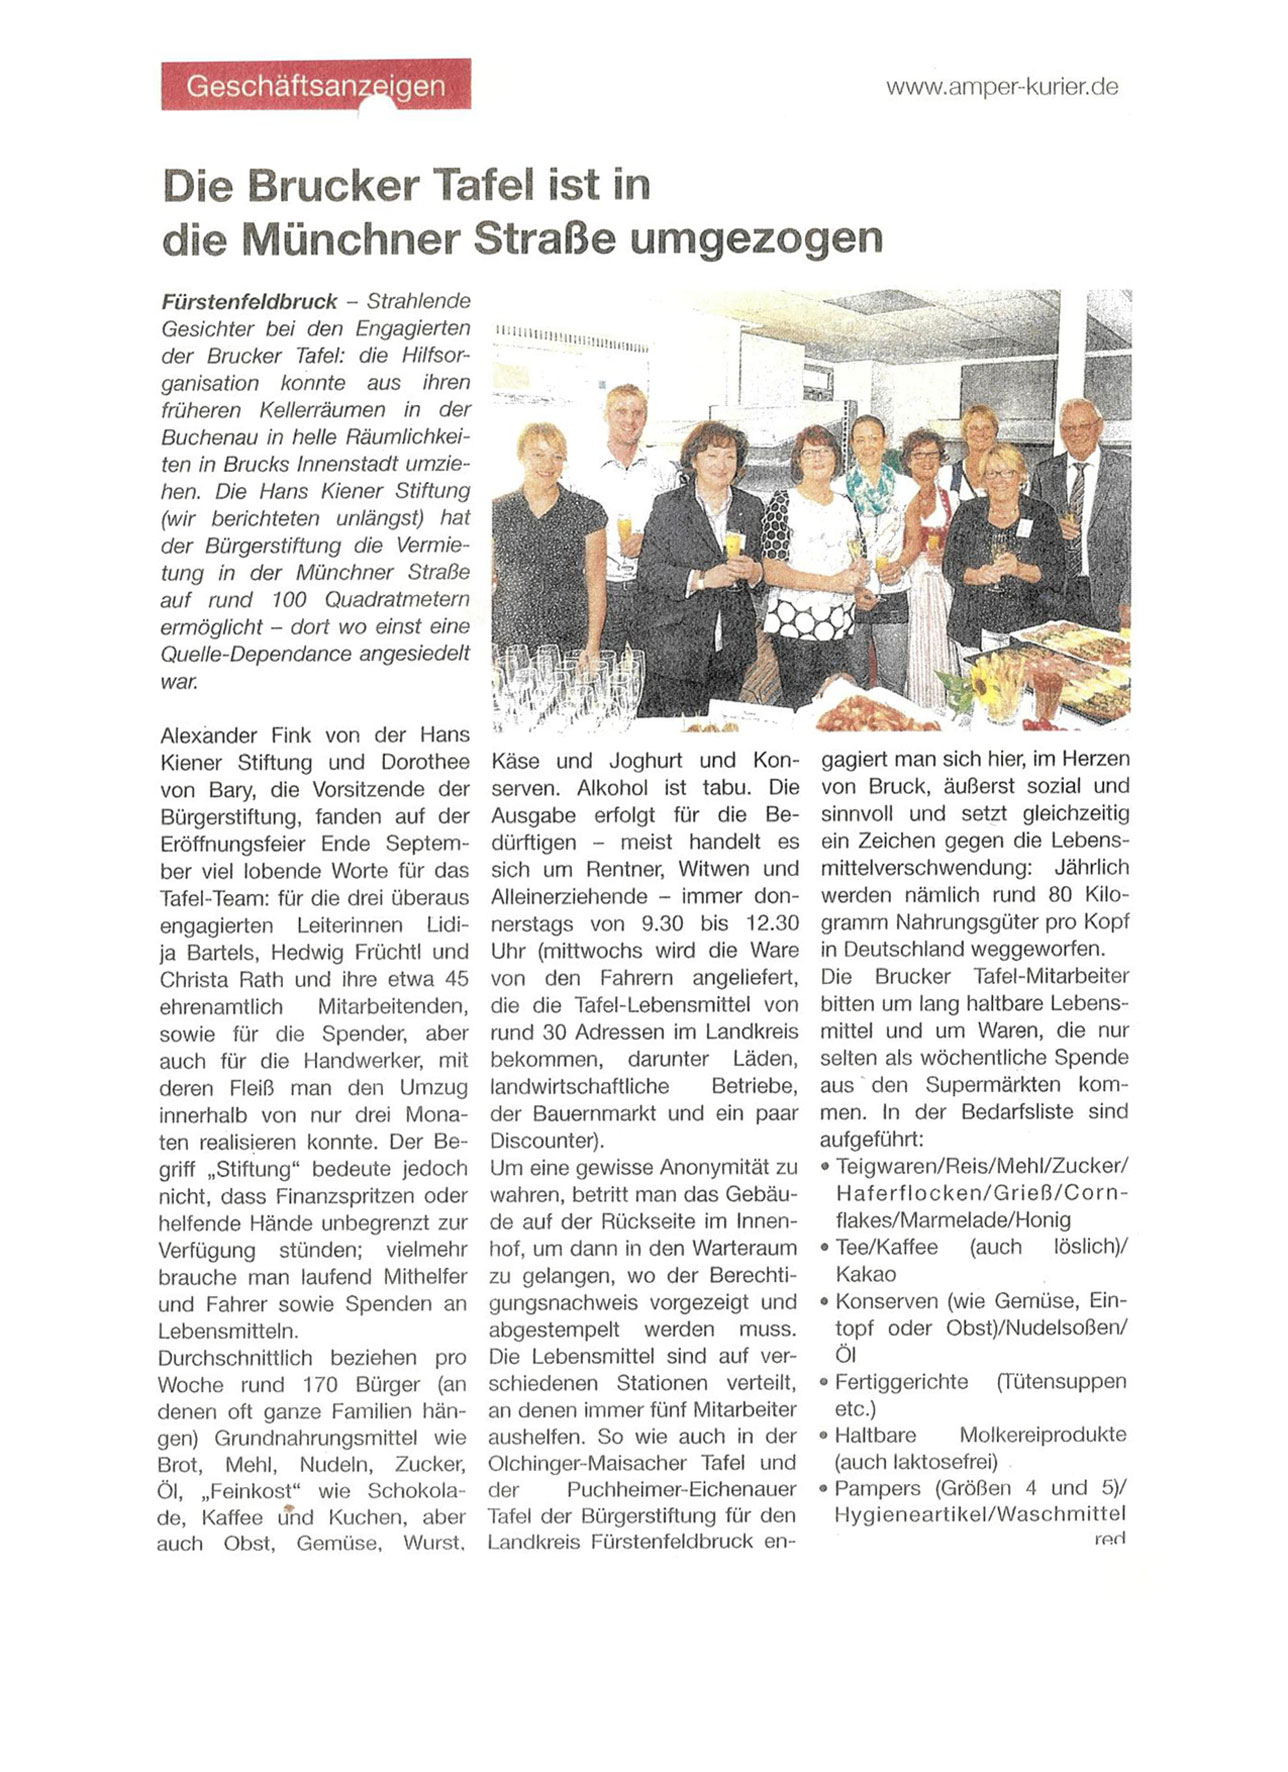 Presse Kiener Stiftung